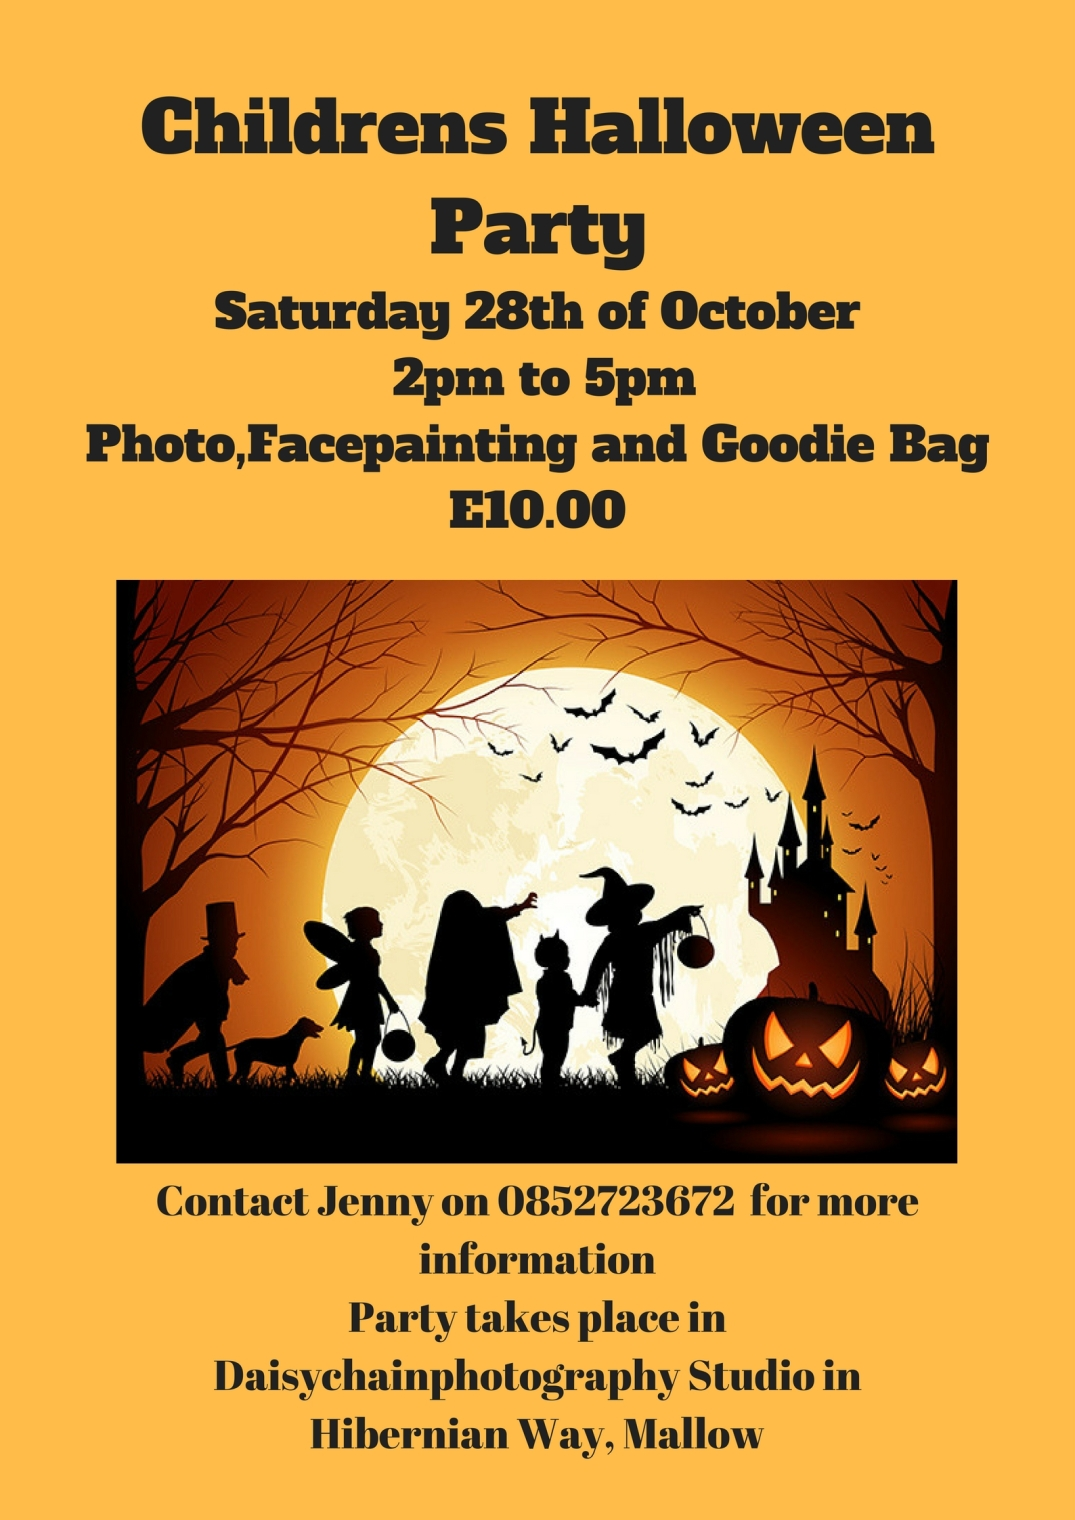 Childrens Halloween Party (1)